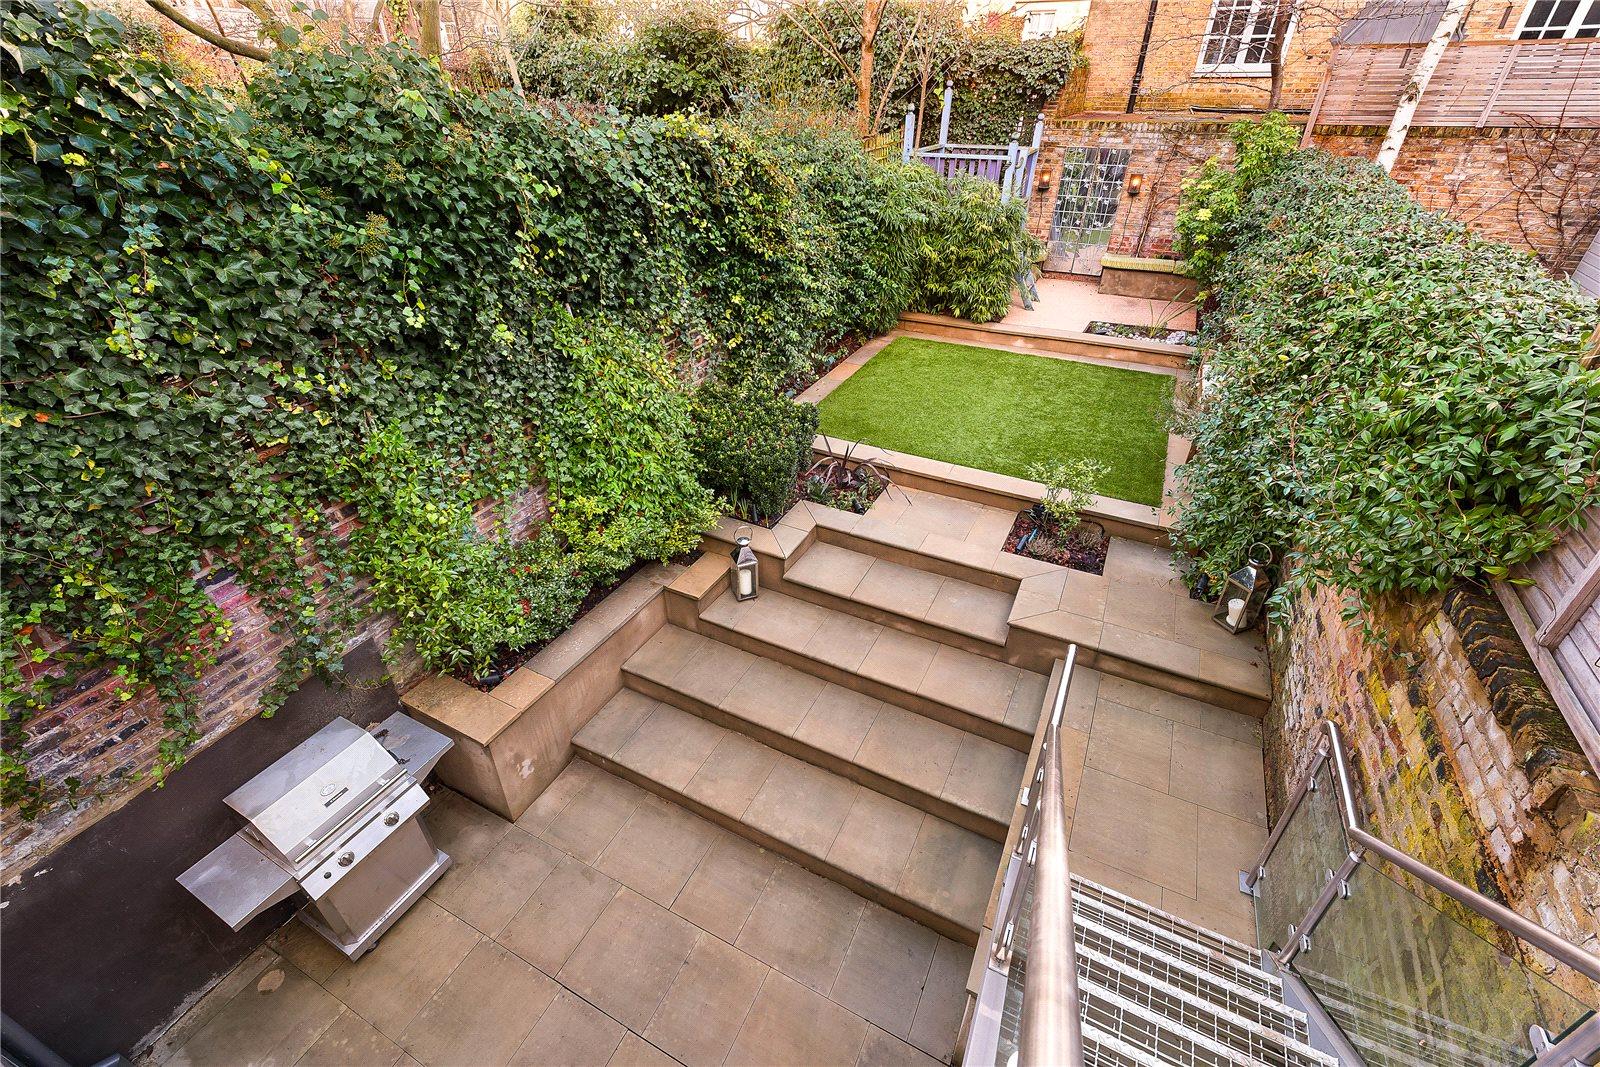 Casa para uma família para Venda às Eldon Road, Kensington, London, W8 Kensington, London, Inglaterra